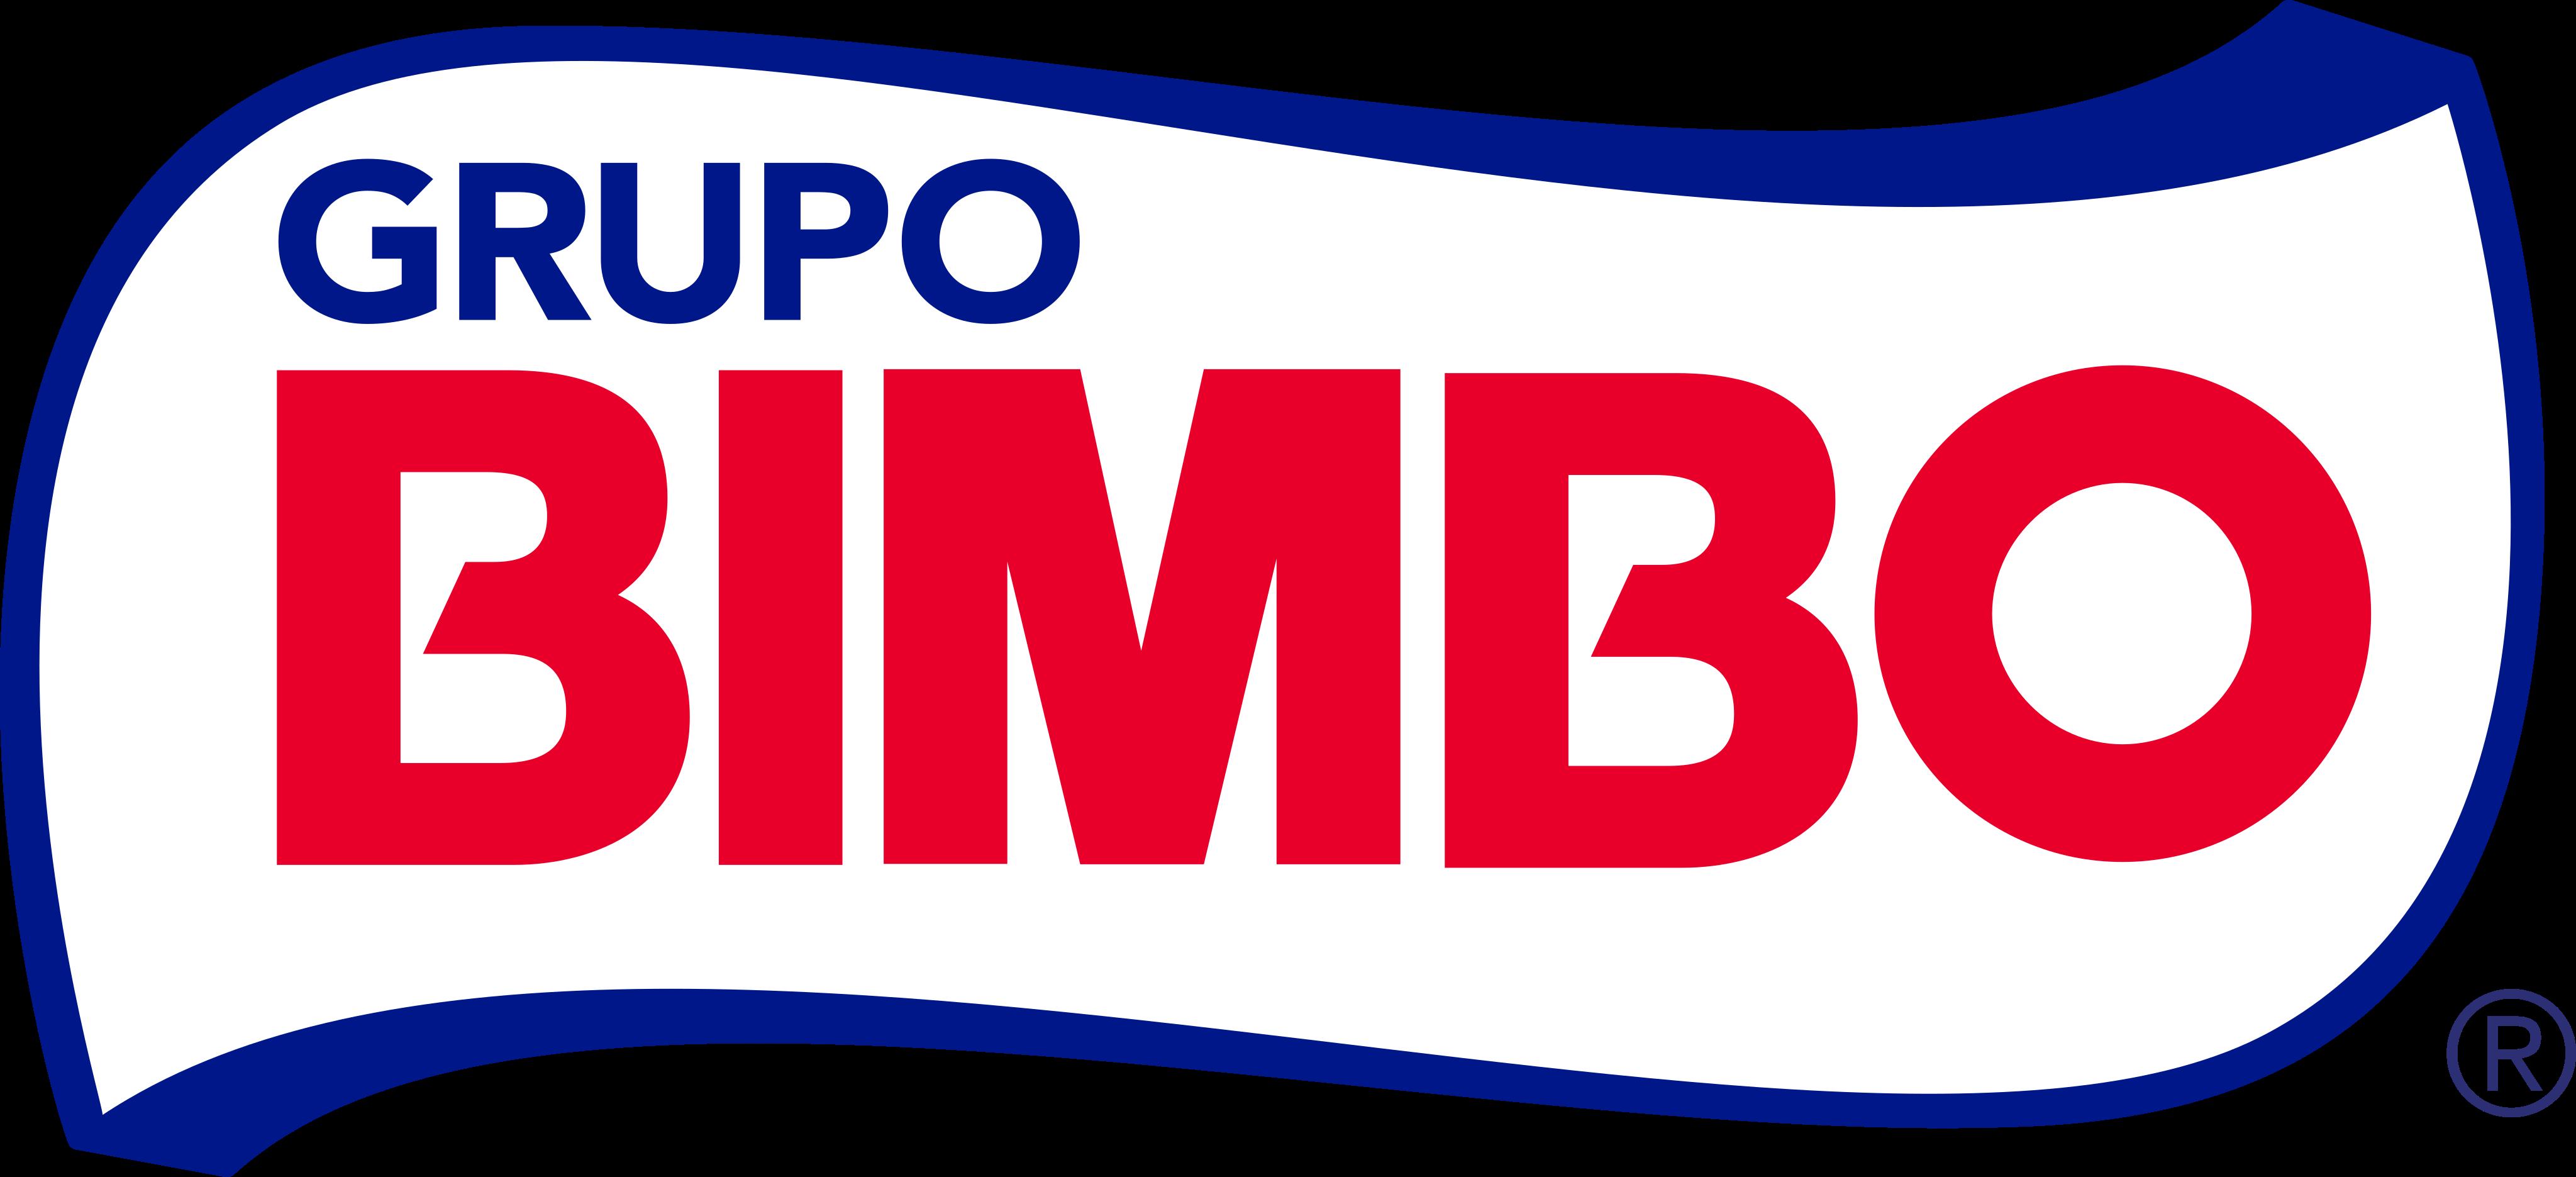 Grupo Bimbo Logo.